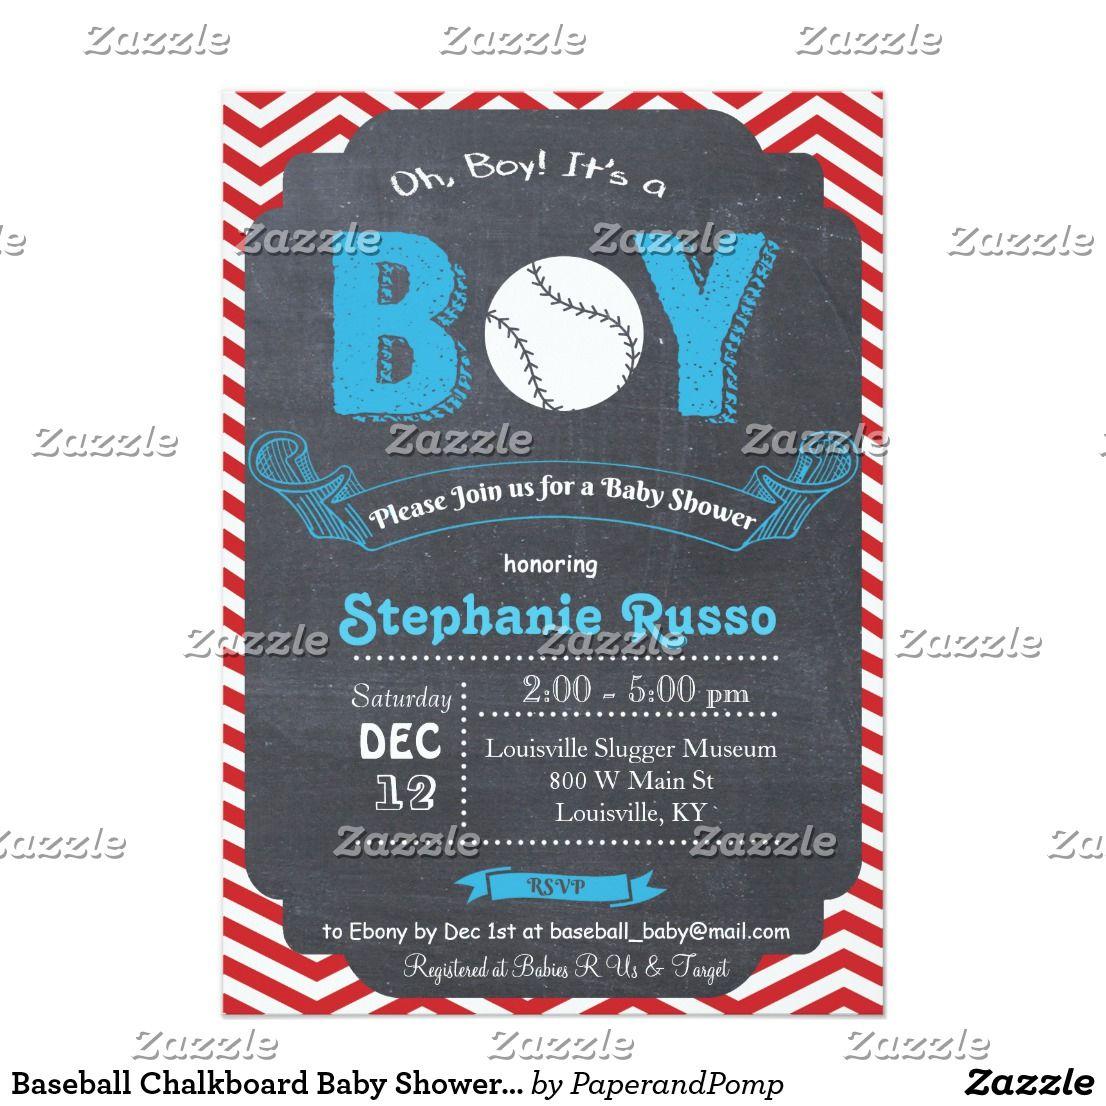 Baseball Chalkboard Baby Shower Invitation | Chalkboard baby ...